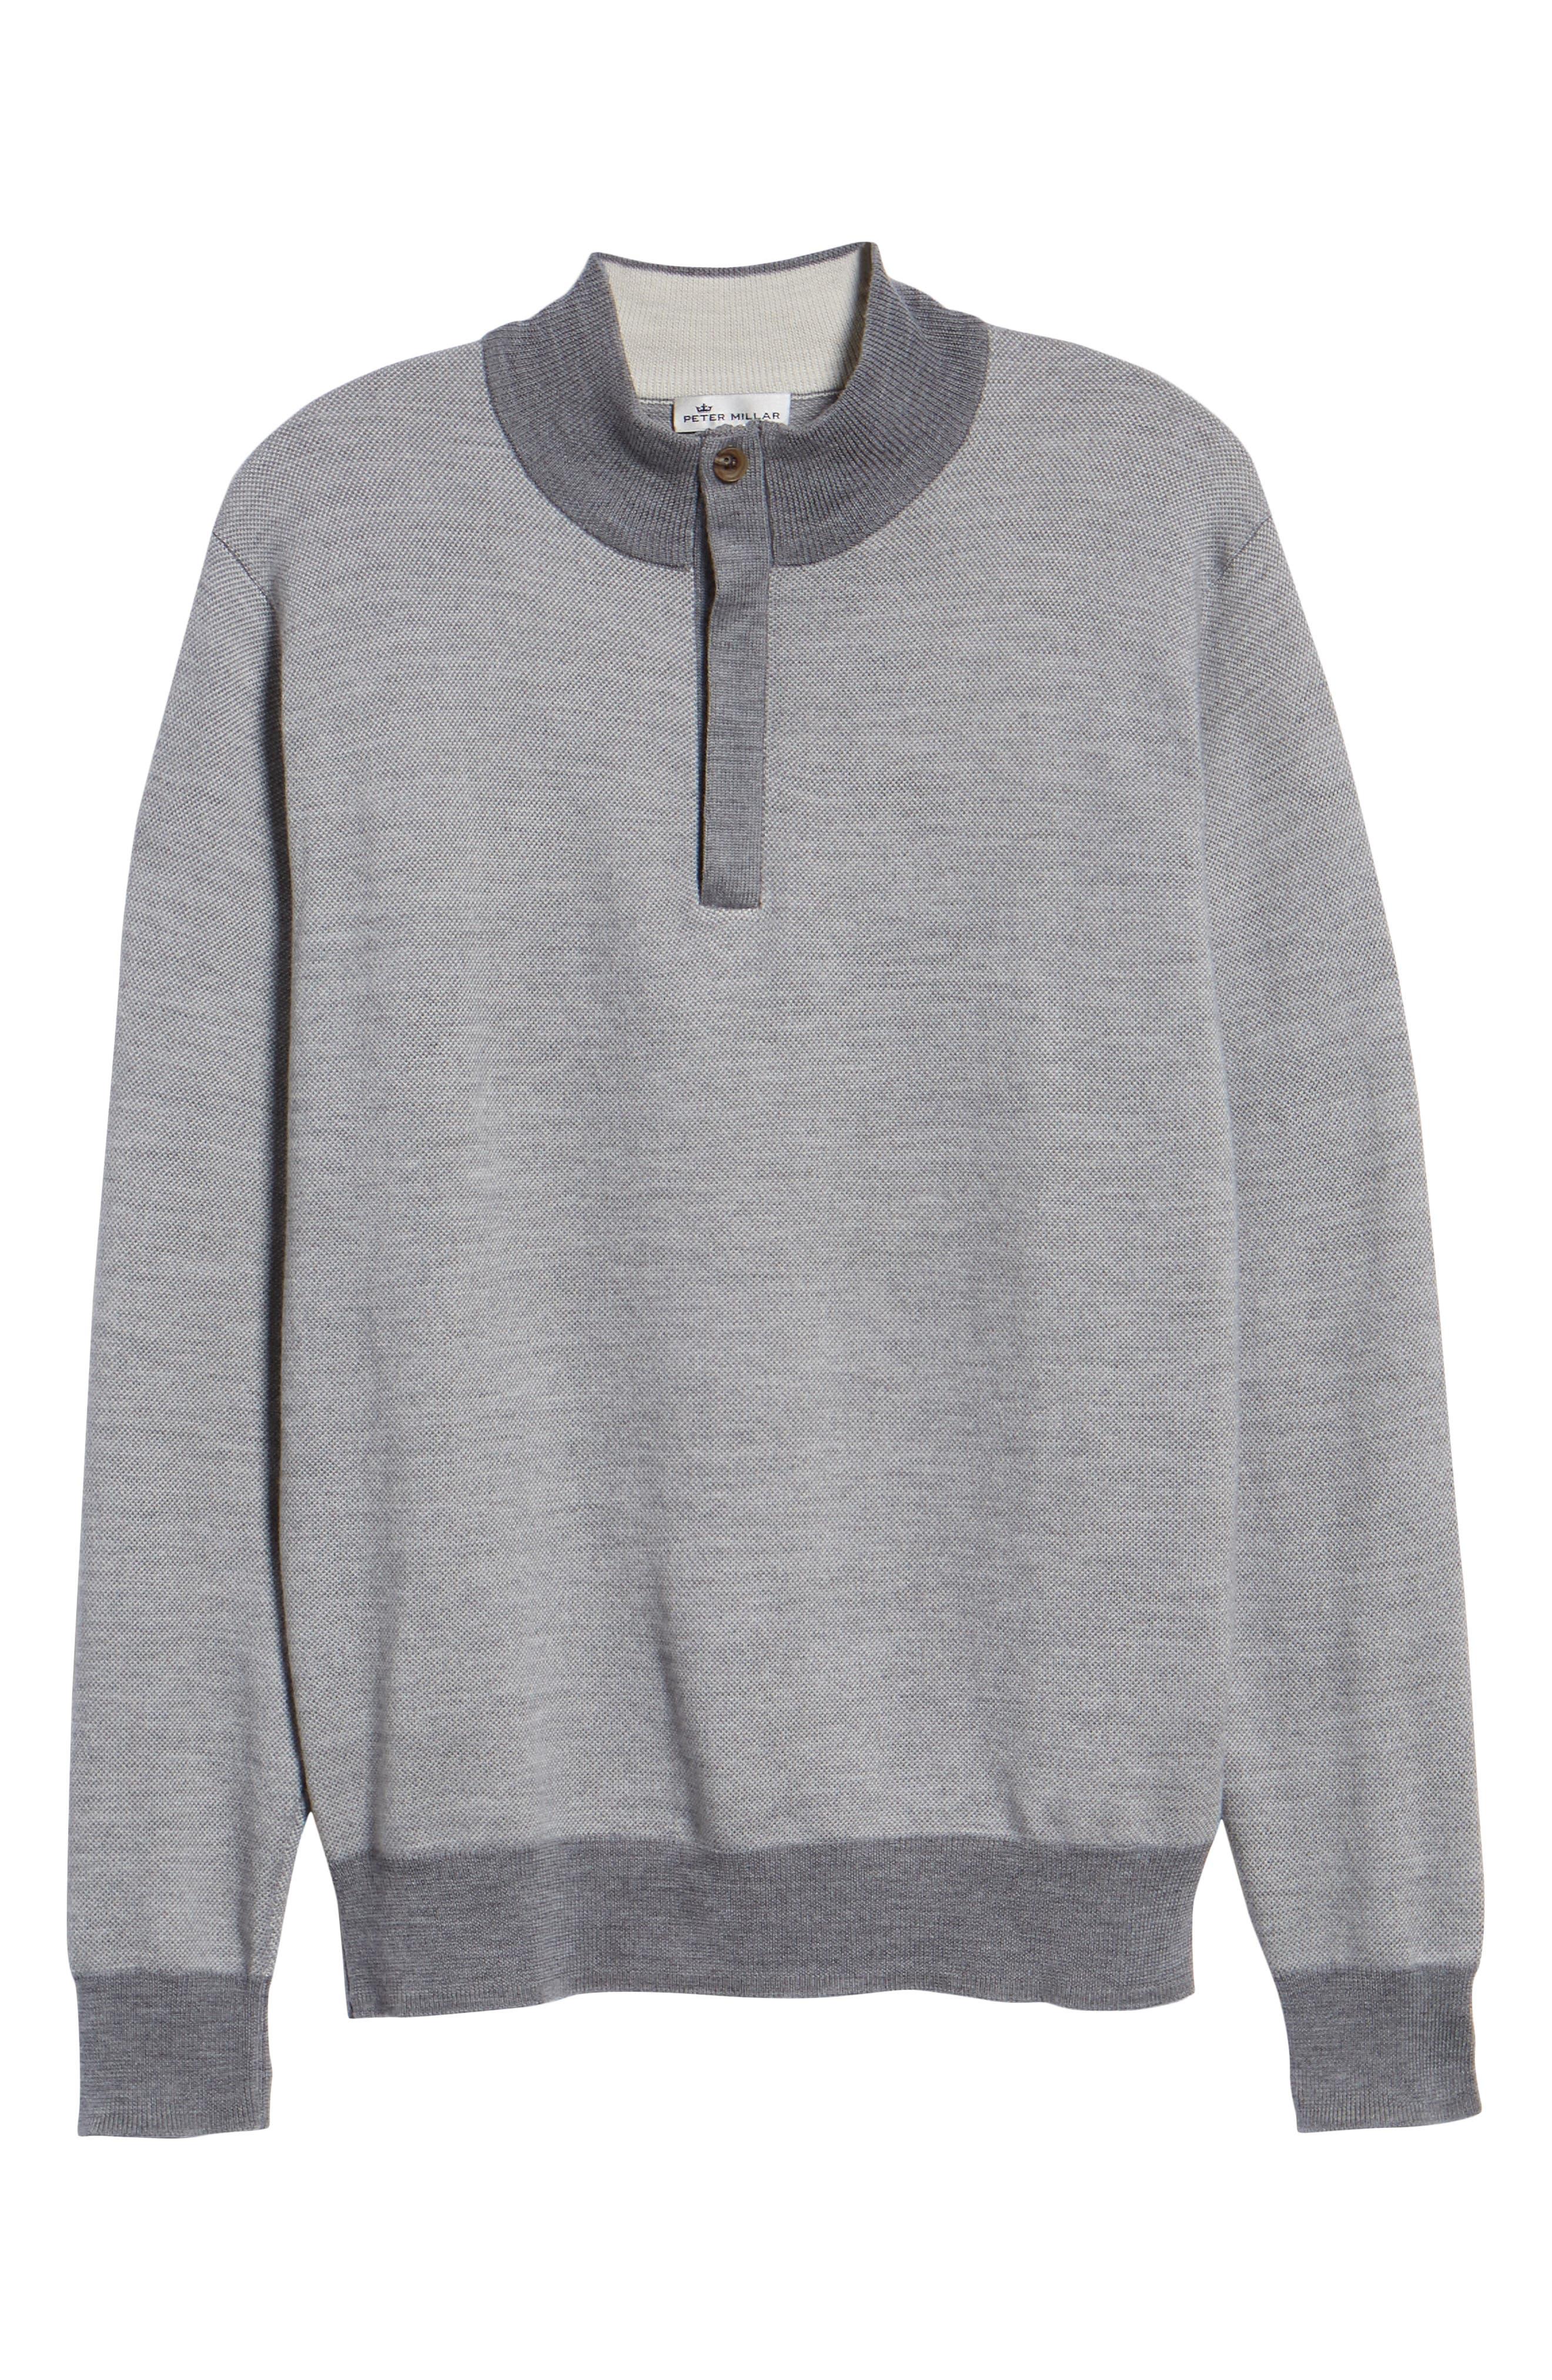 Birdseye Merino Wool Quarter Zip Sweater,                             Alternate thumbnail 6, color,                             BRITISH GREY